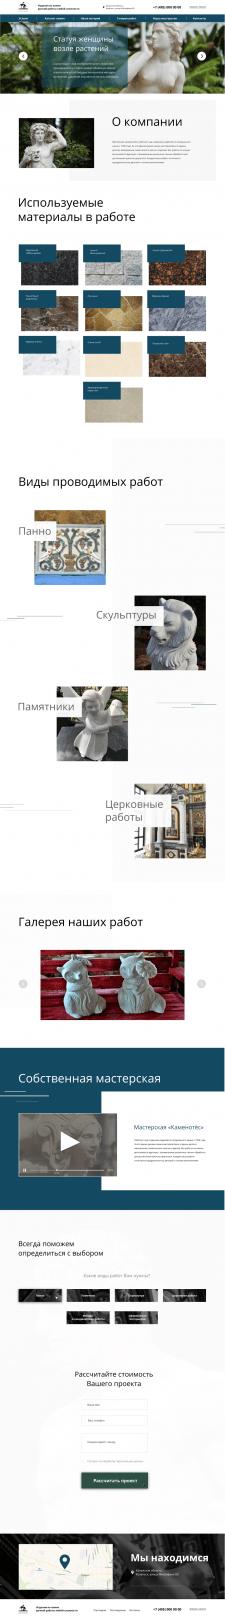 Дизайн Каменотес (Корпоративный сайт)